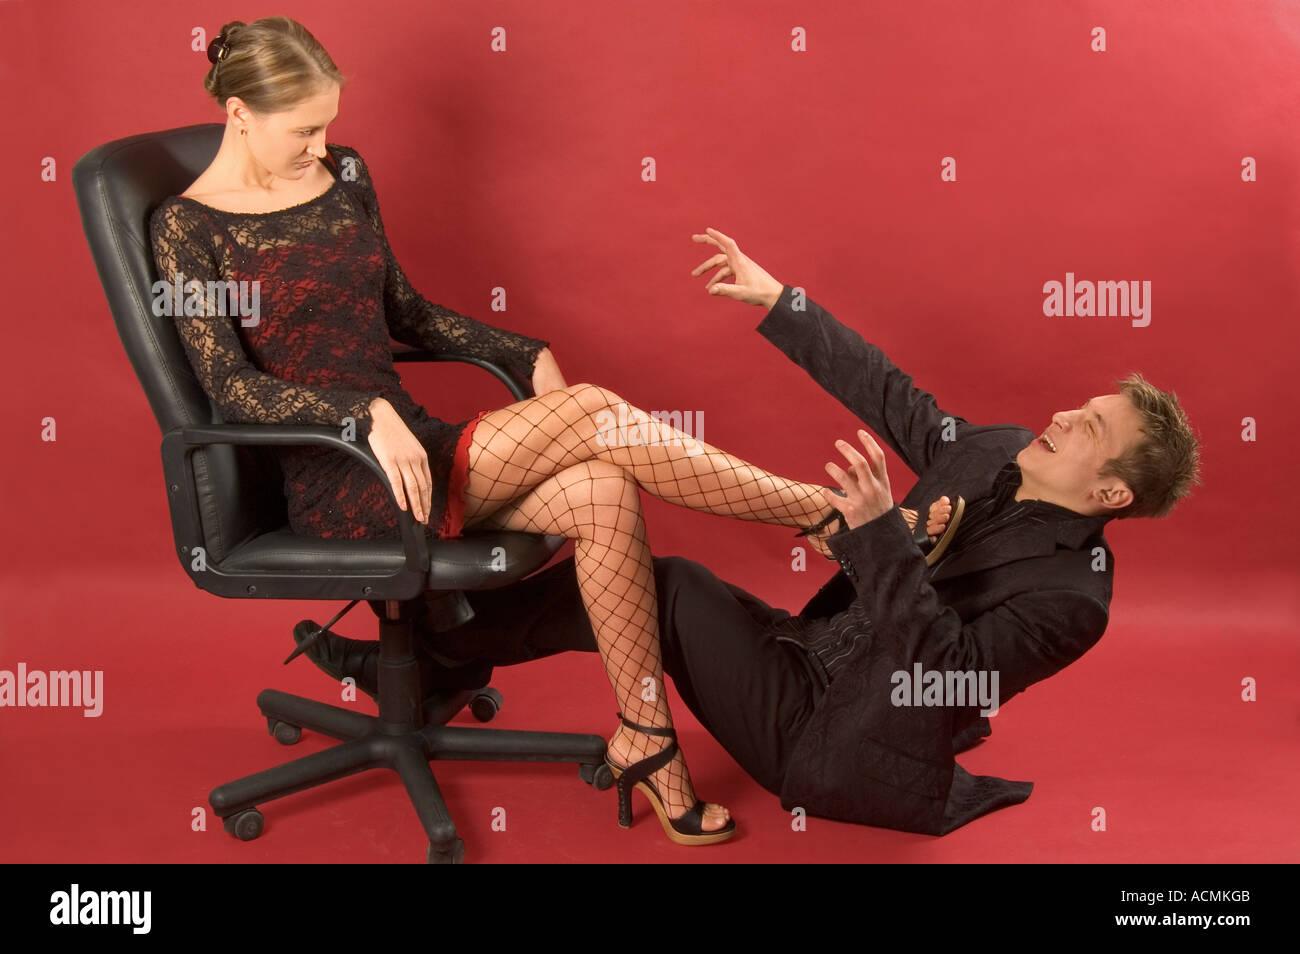 Woman hitting the man - Stock Image